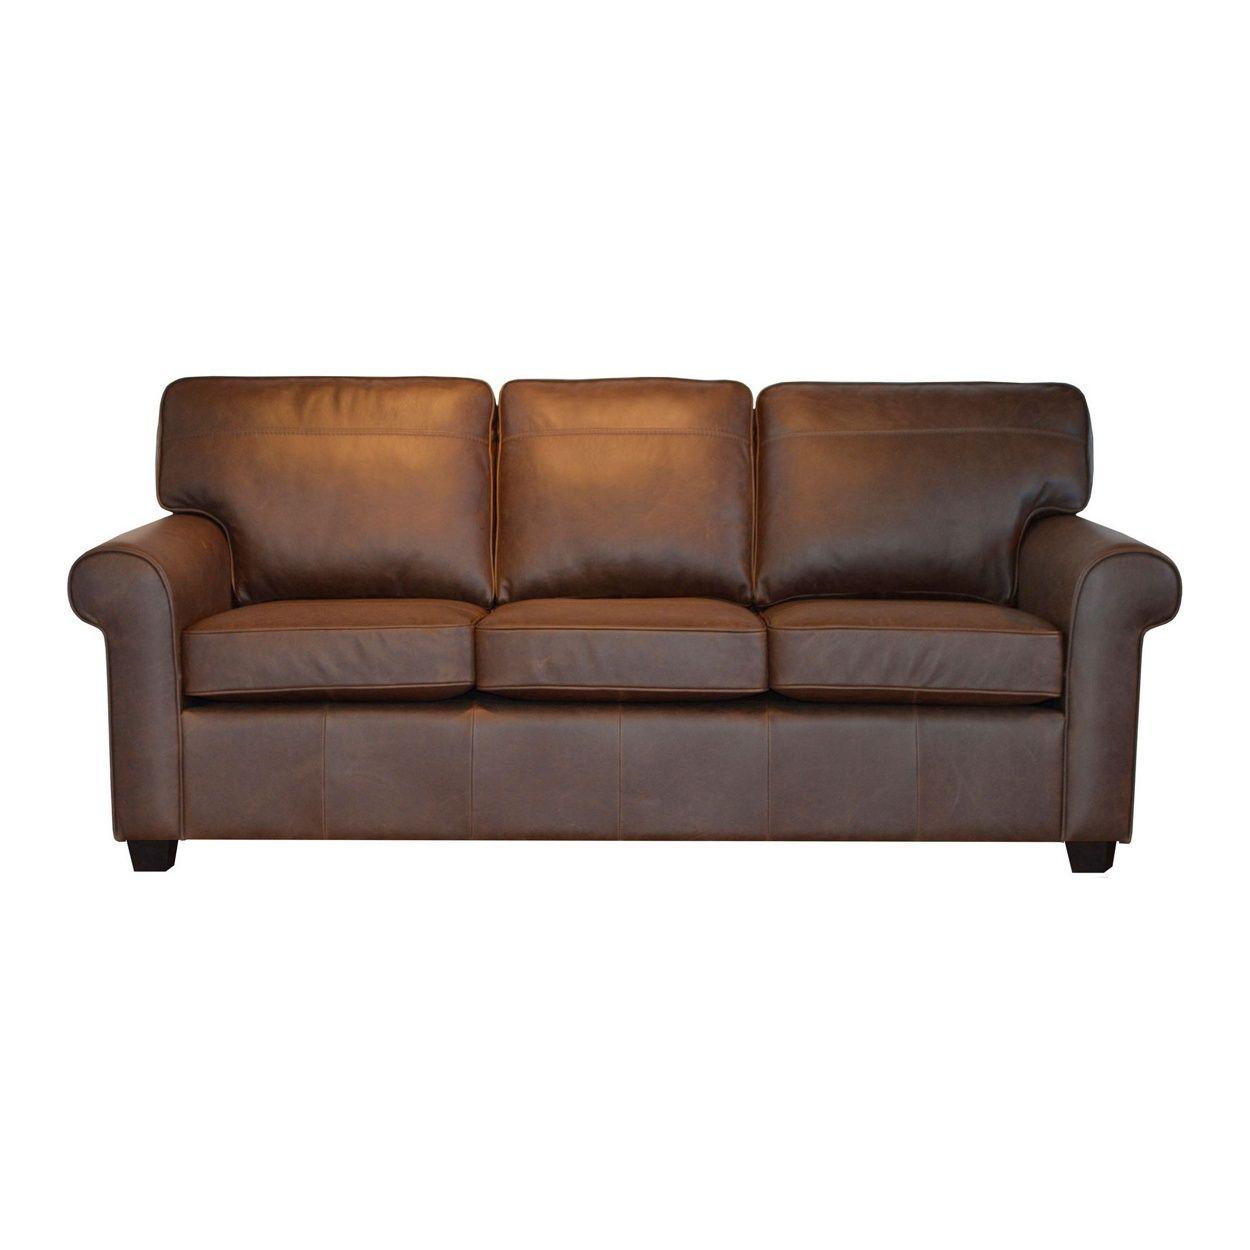 Debenhams Large Leather Oban Sofa Debenhams Lounges with regard to measurements 1250 X 1250